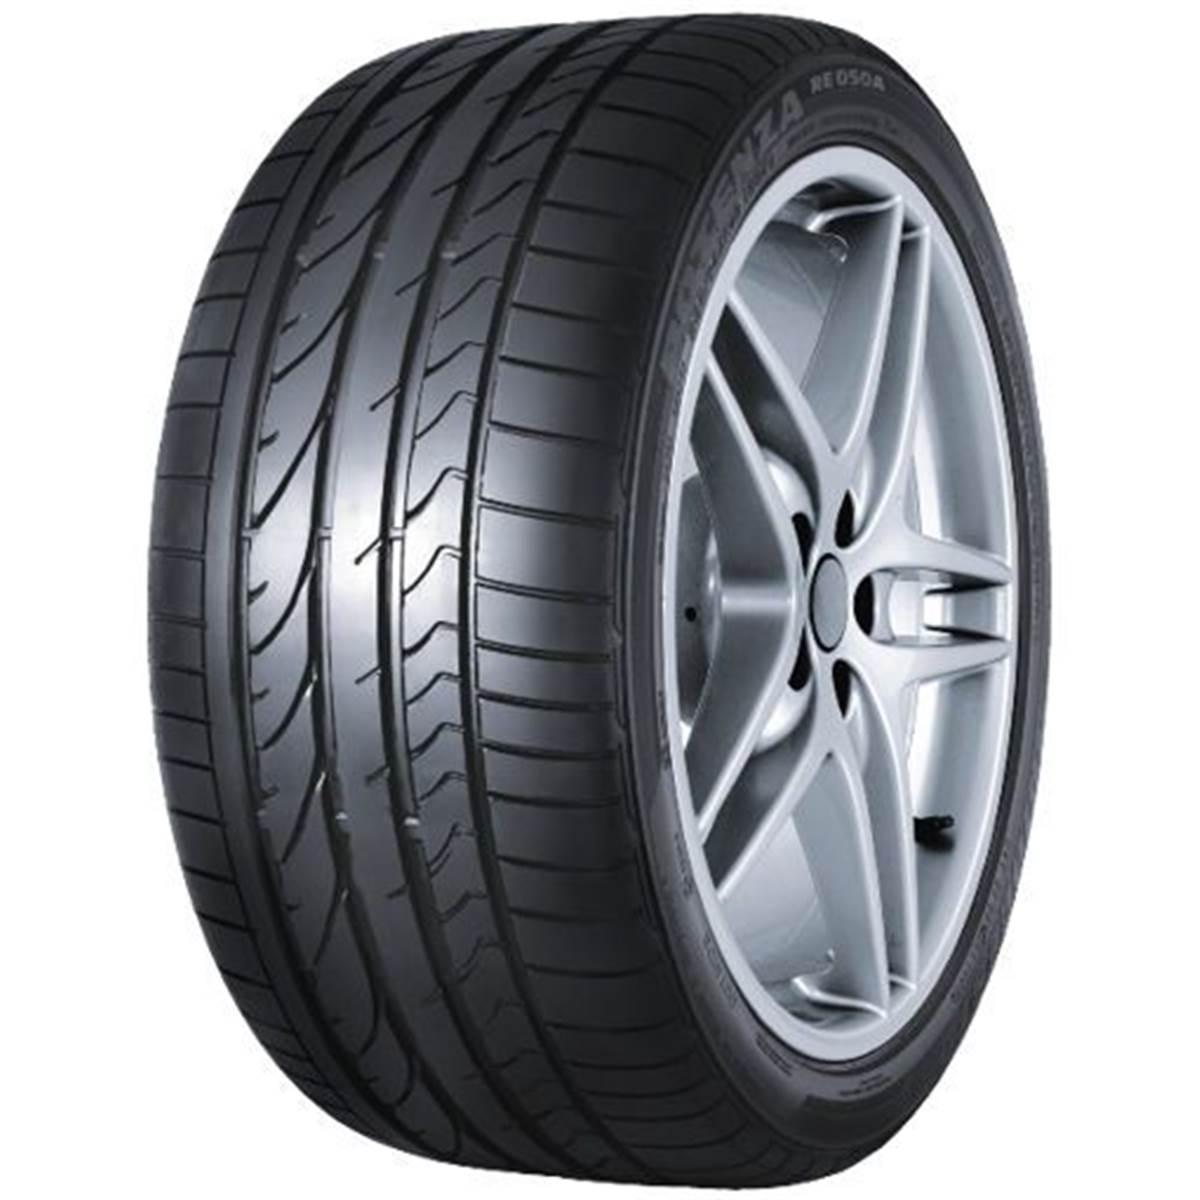 Pneu Bridgestone 245/40R19 94W Potenza Re050